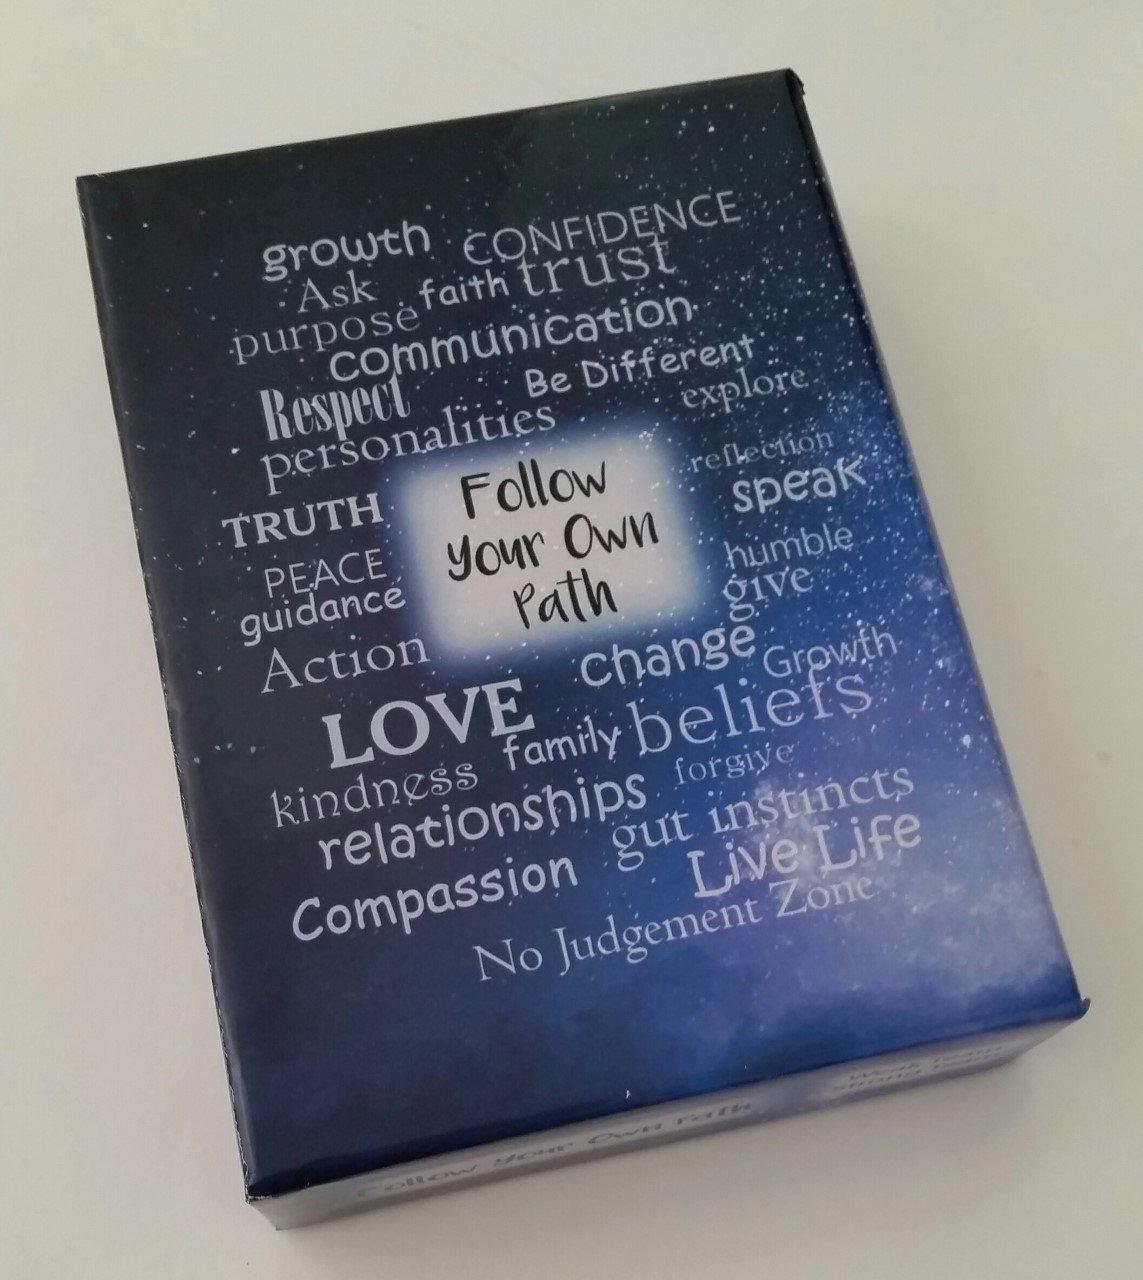 Weaker Gut Instinct Makes Teens Open To >> Follow Your Own Path Kathleen Costa 9780692706787 Amazon Com Books